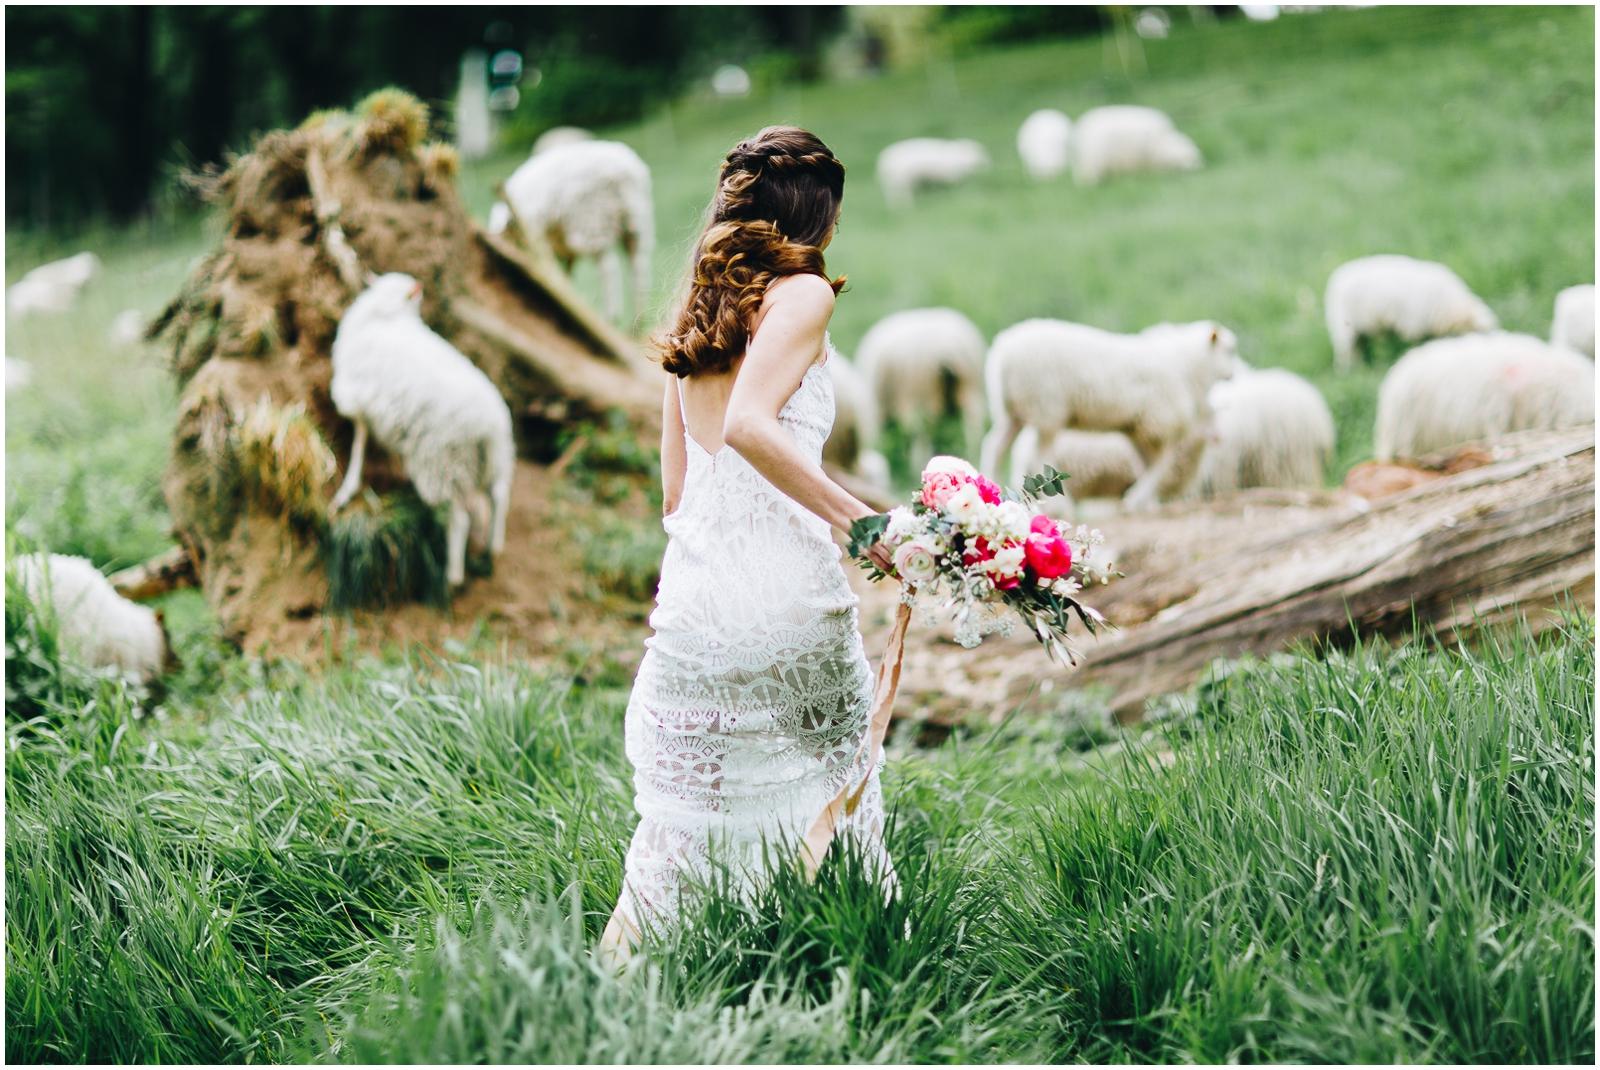 LE HAI LINH Photography-Hochzeitsfotograf-Bohohochzeit-_0052.jpg